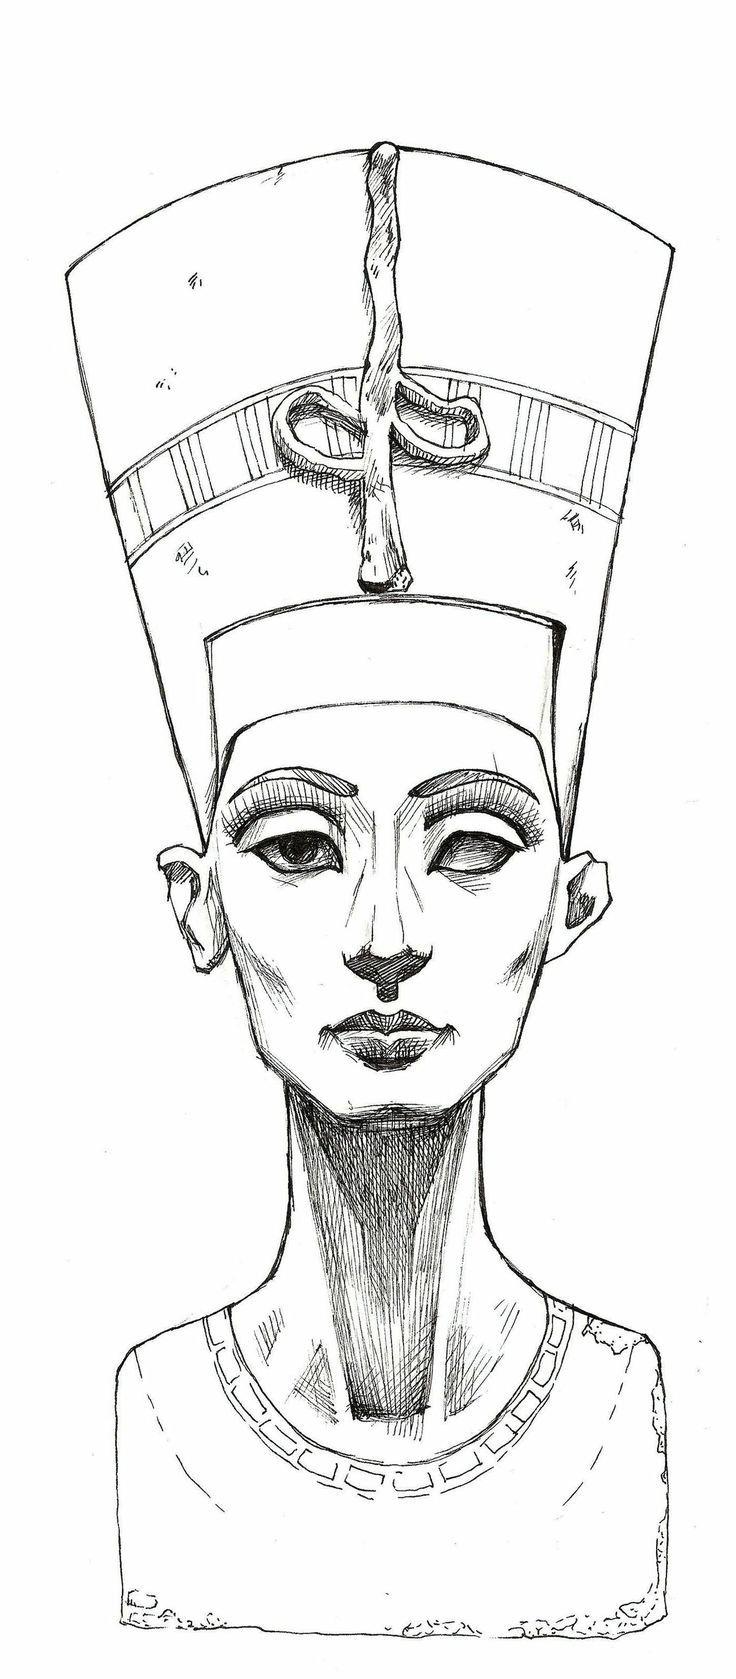 Egyptian goddess isis tattoo google search tattoos pinterest egyptian goddess isis tattoo google search buycottarizona